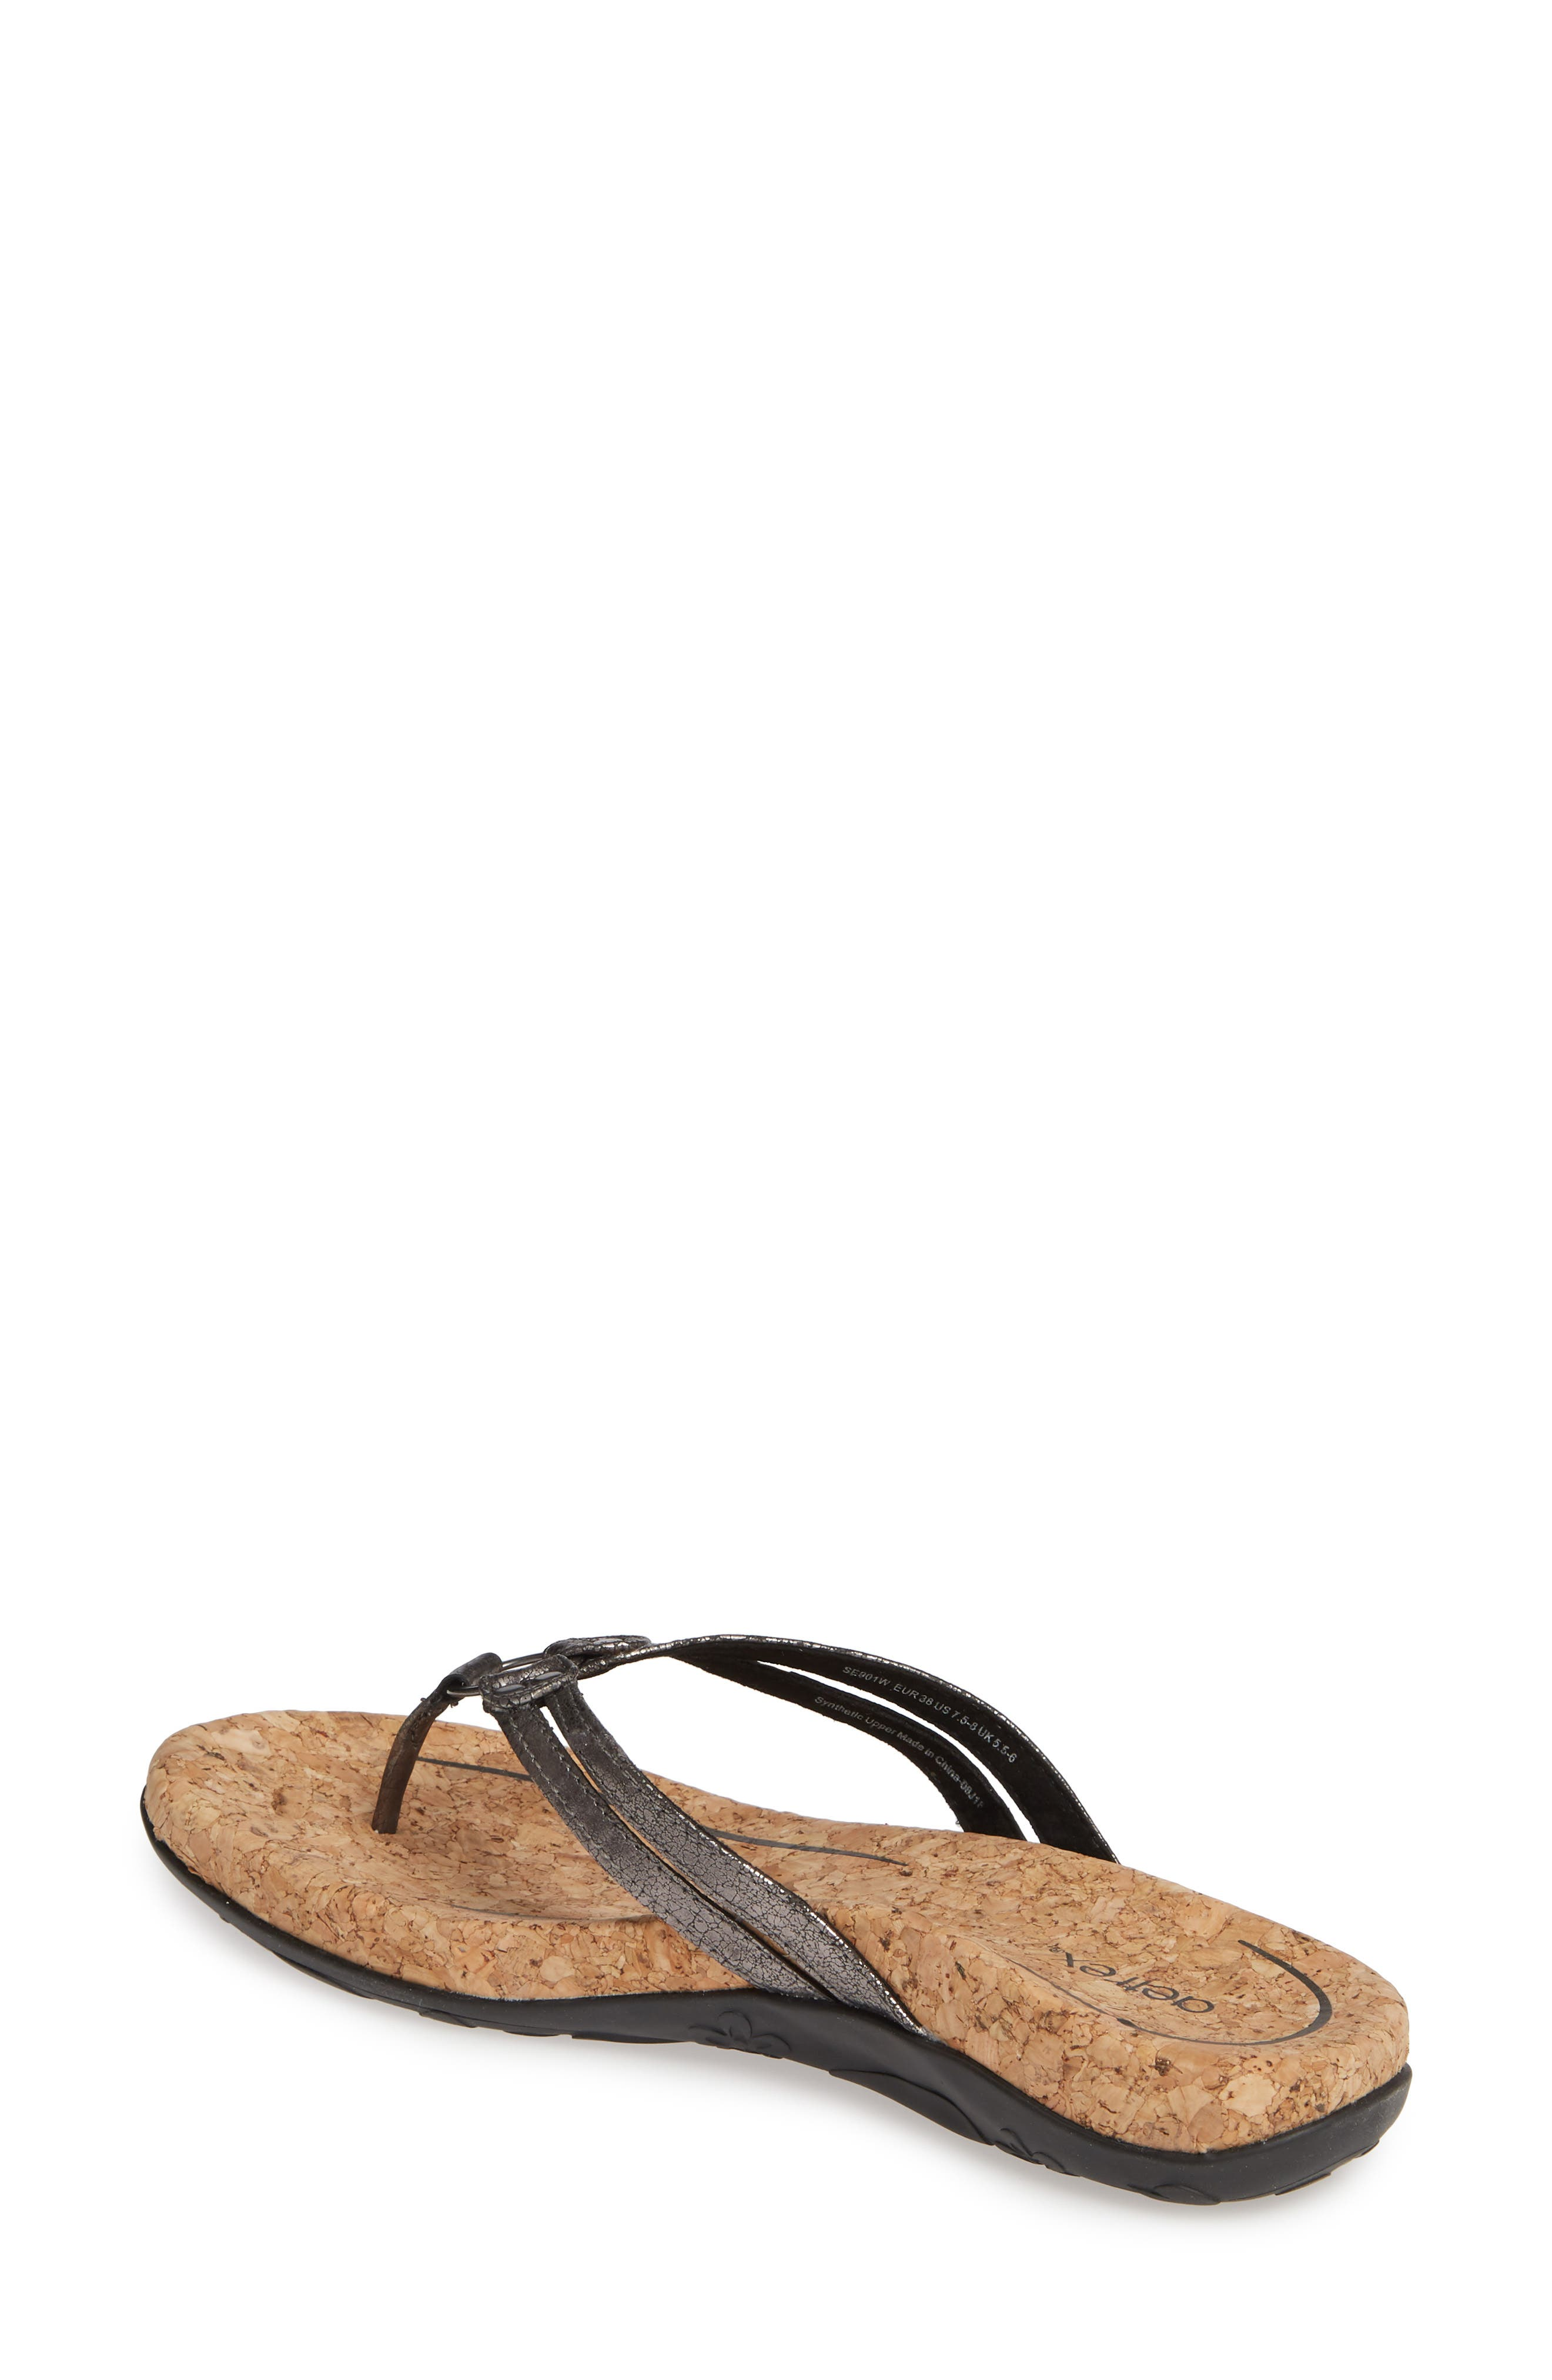 505b3fae21f9f4 Aetrex Flip-Flops   Sandals for Women